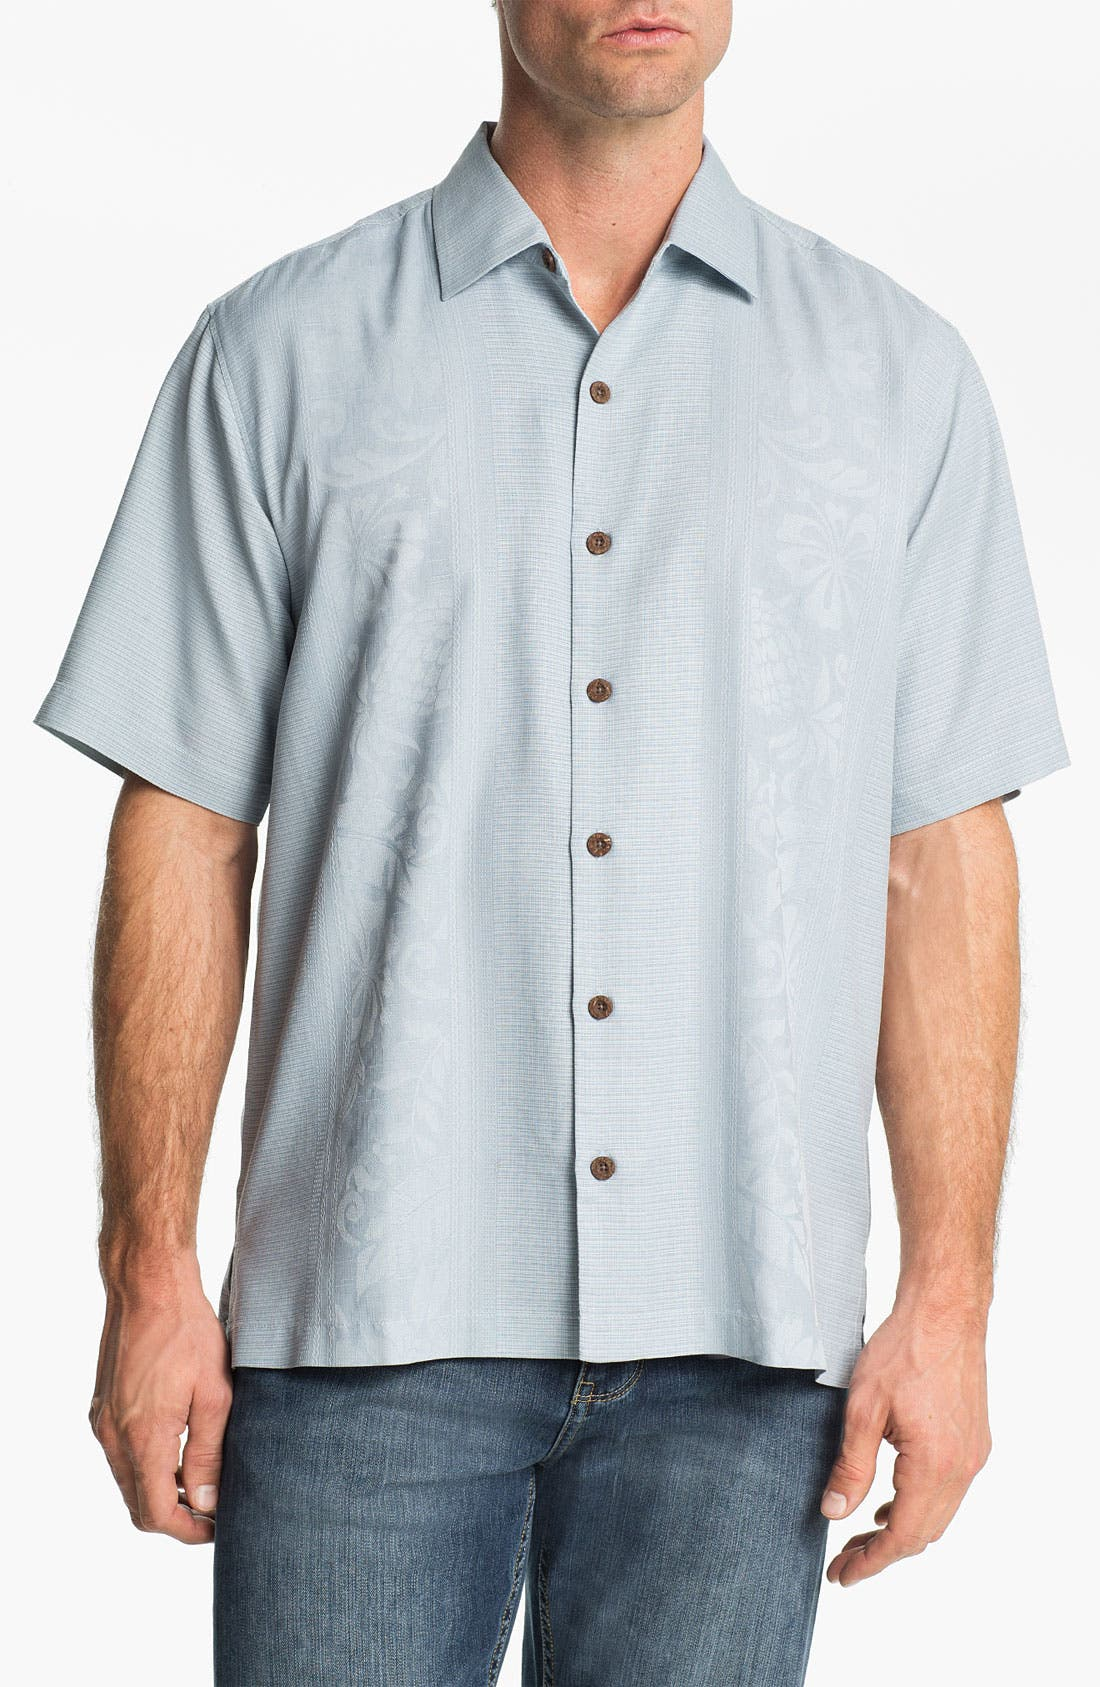 Main Image - Tommy Bahama 'Amazon' Original Fit Silk Jacquard Camp Shirt